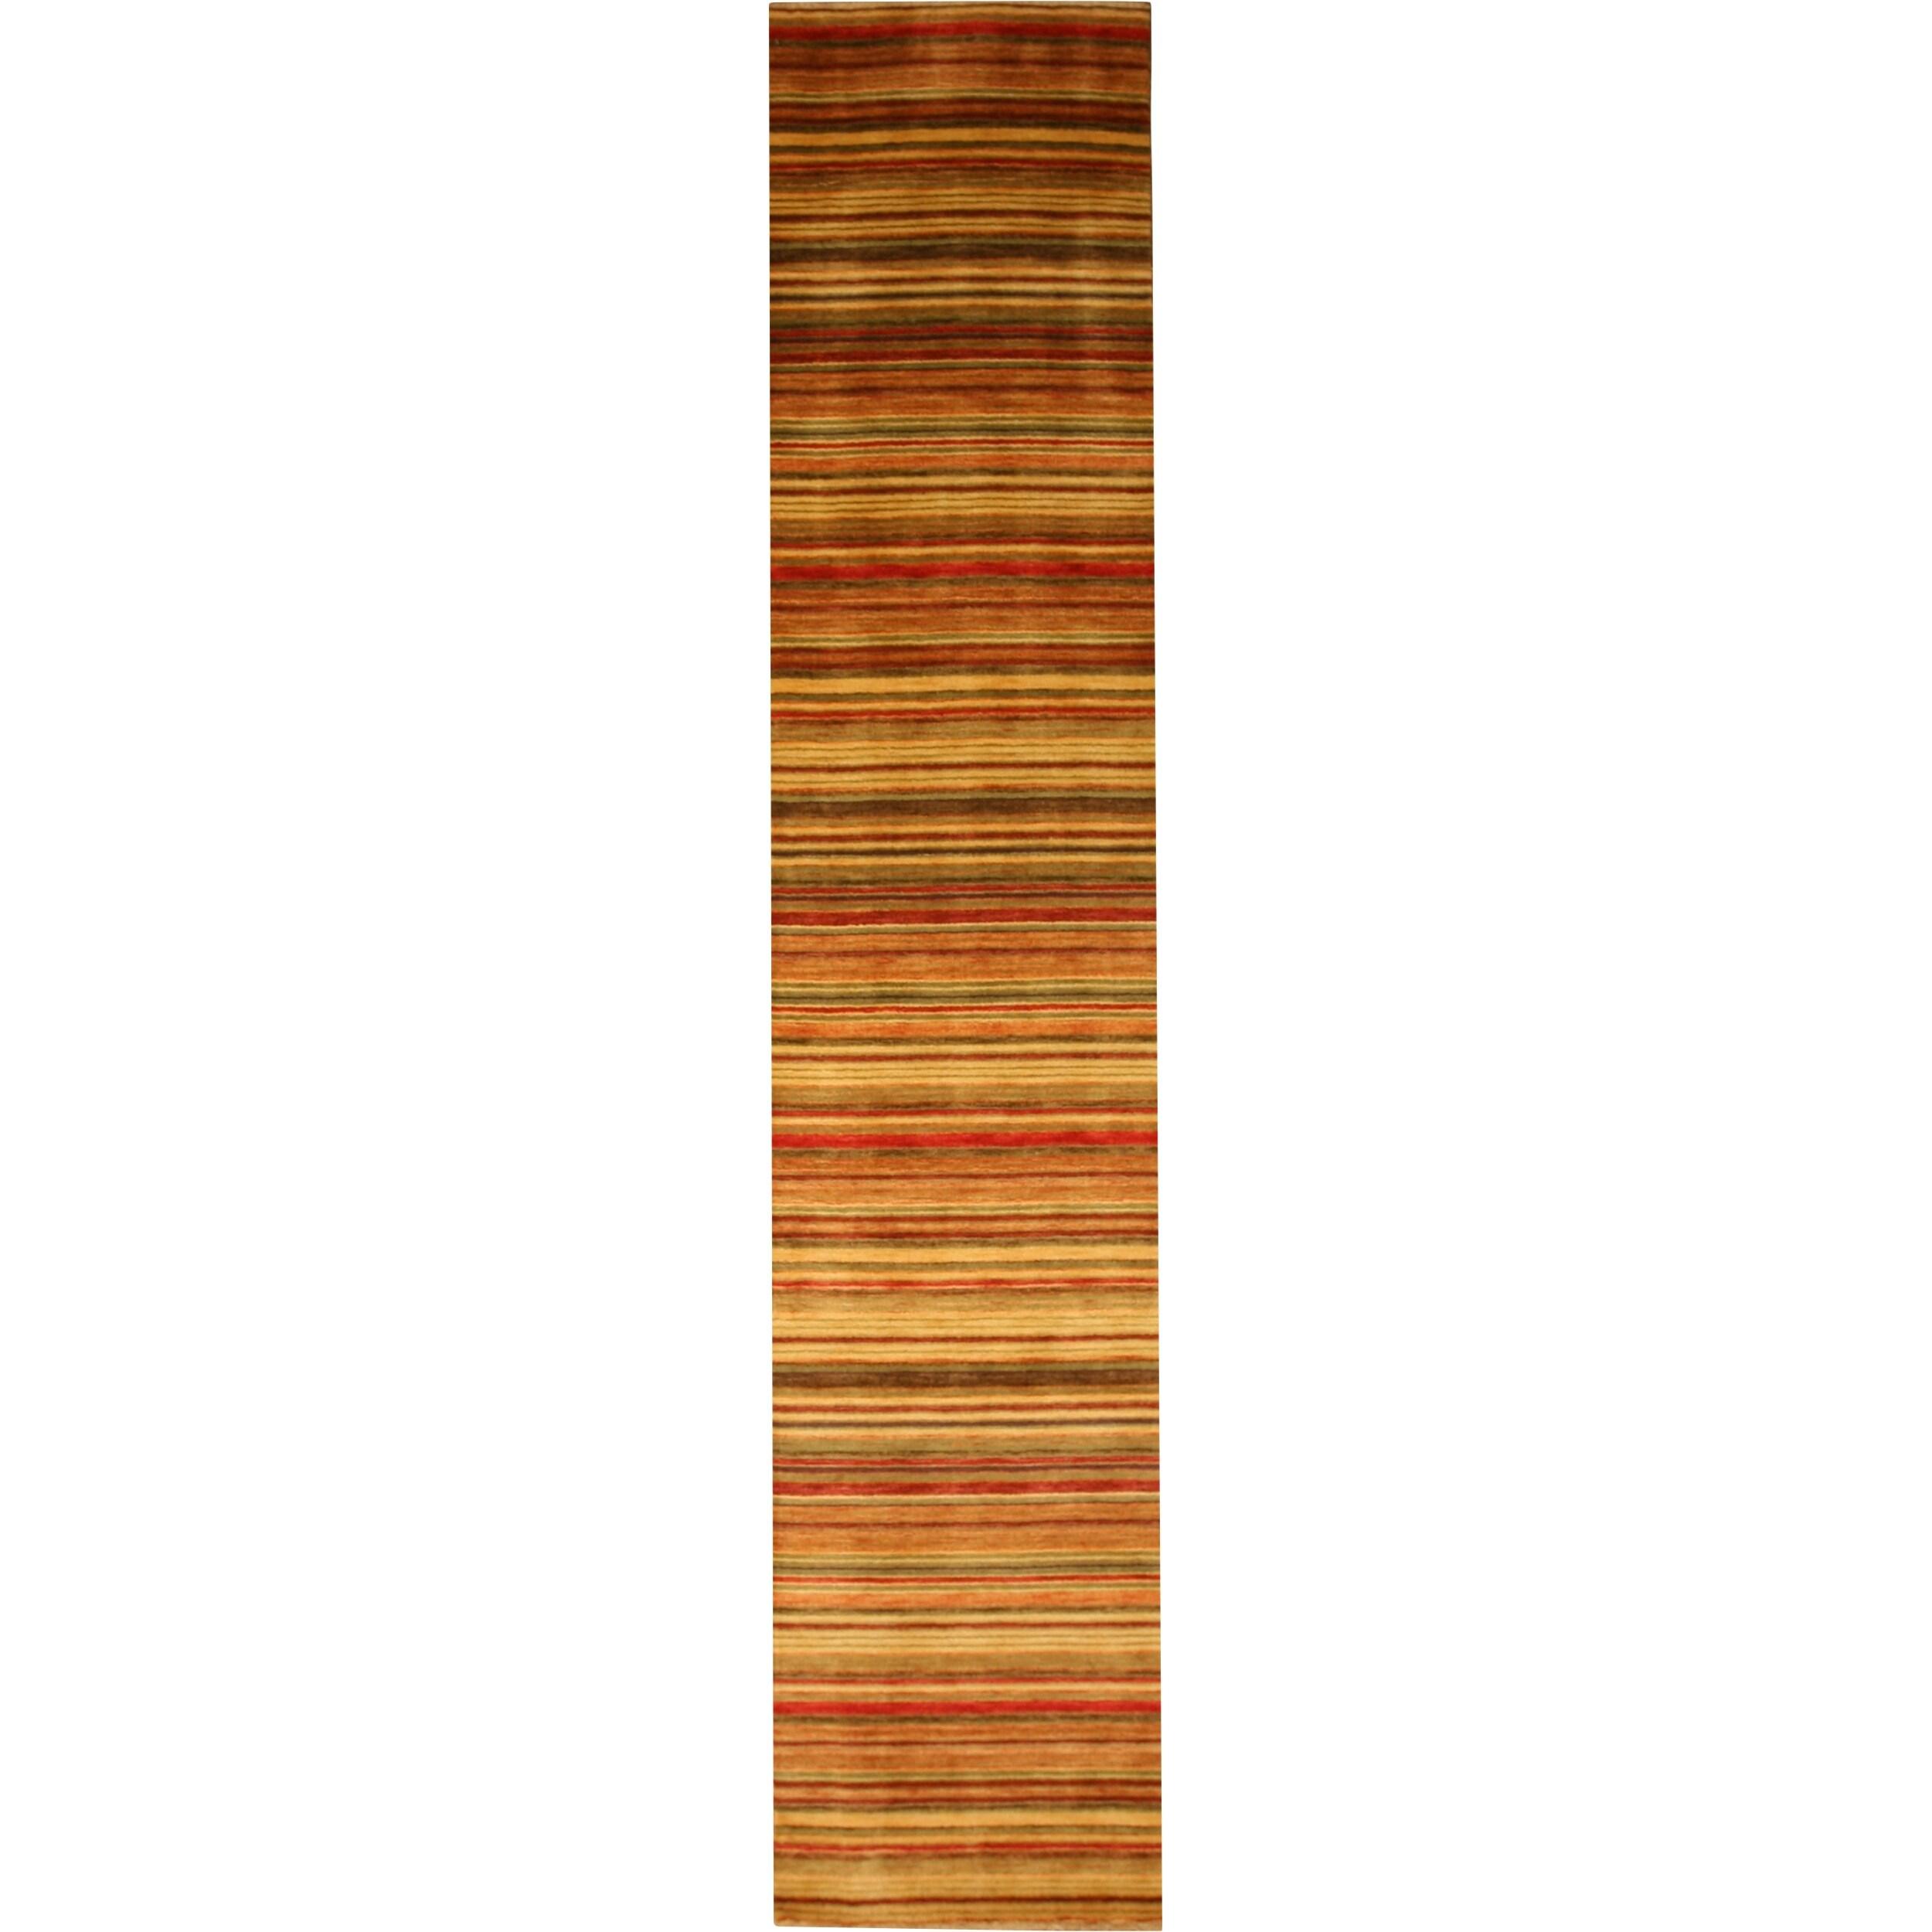 Handmade Wool Transitional Stripe Lori Toni Rug - 2 x 6 (2 x 6)